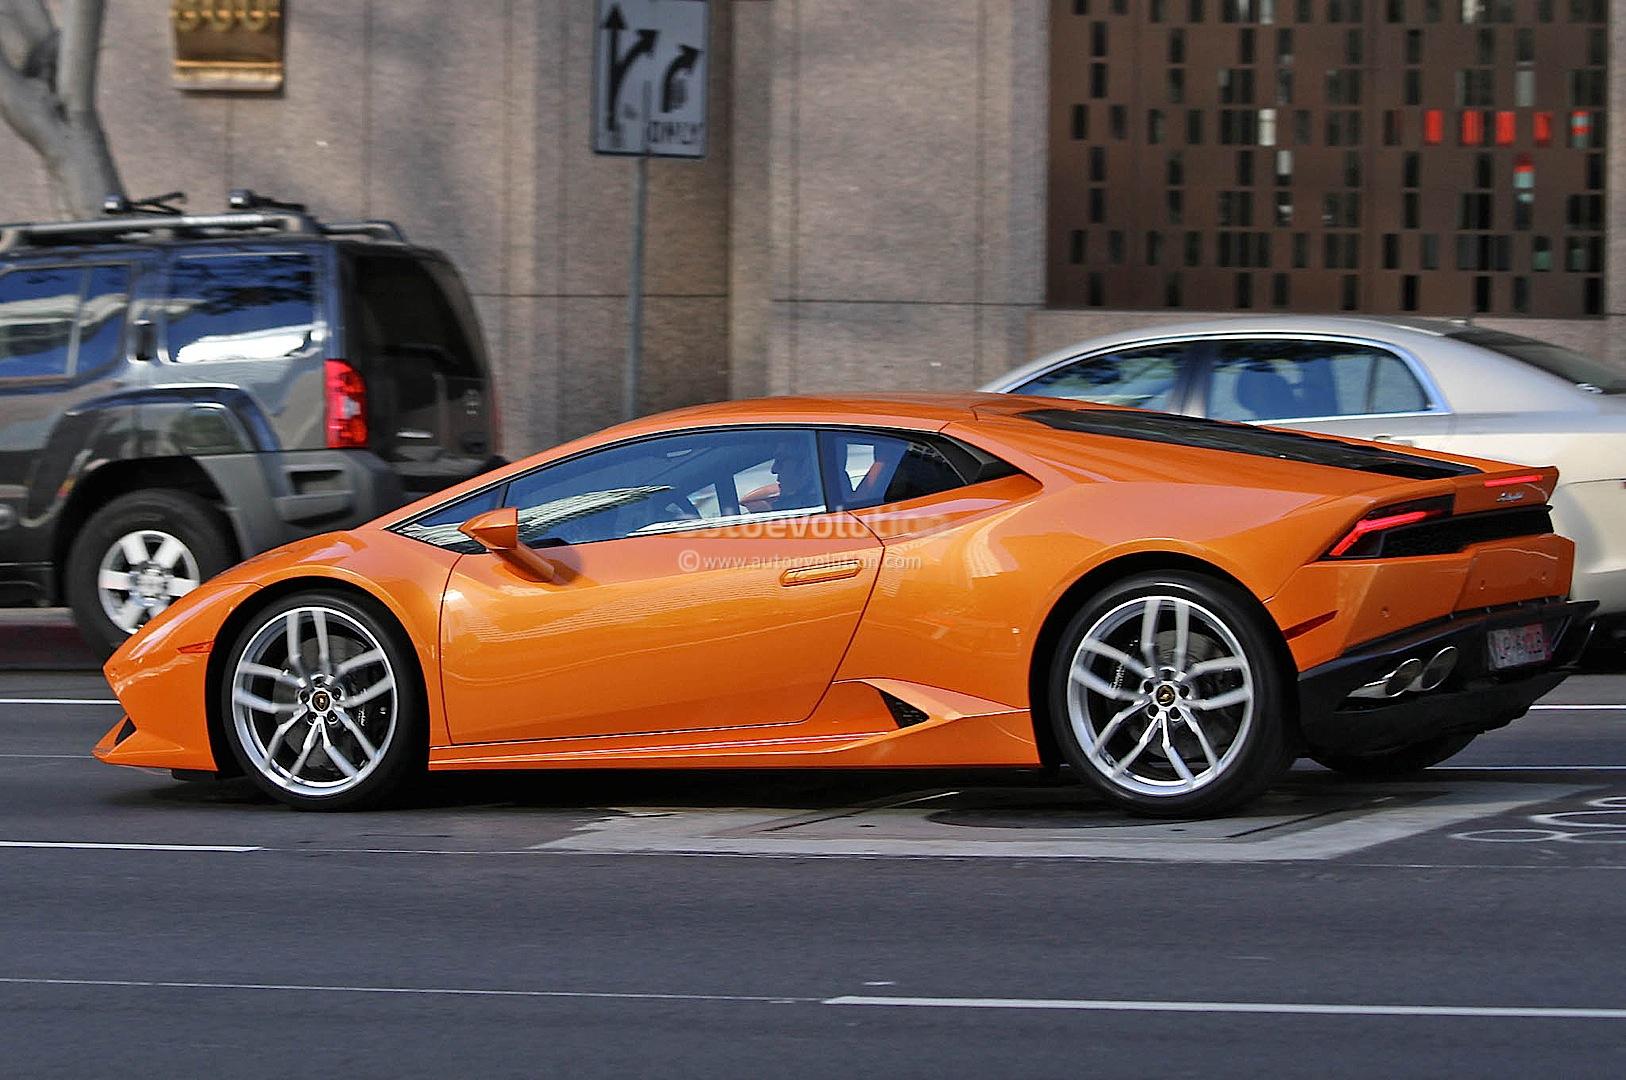 spyshots orange lamborghini huracan street racing in the us - Lamborghini Huracan Orange Interior